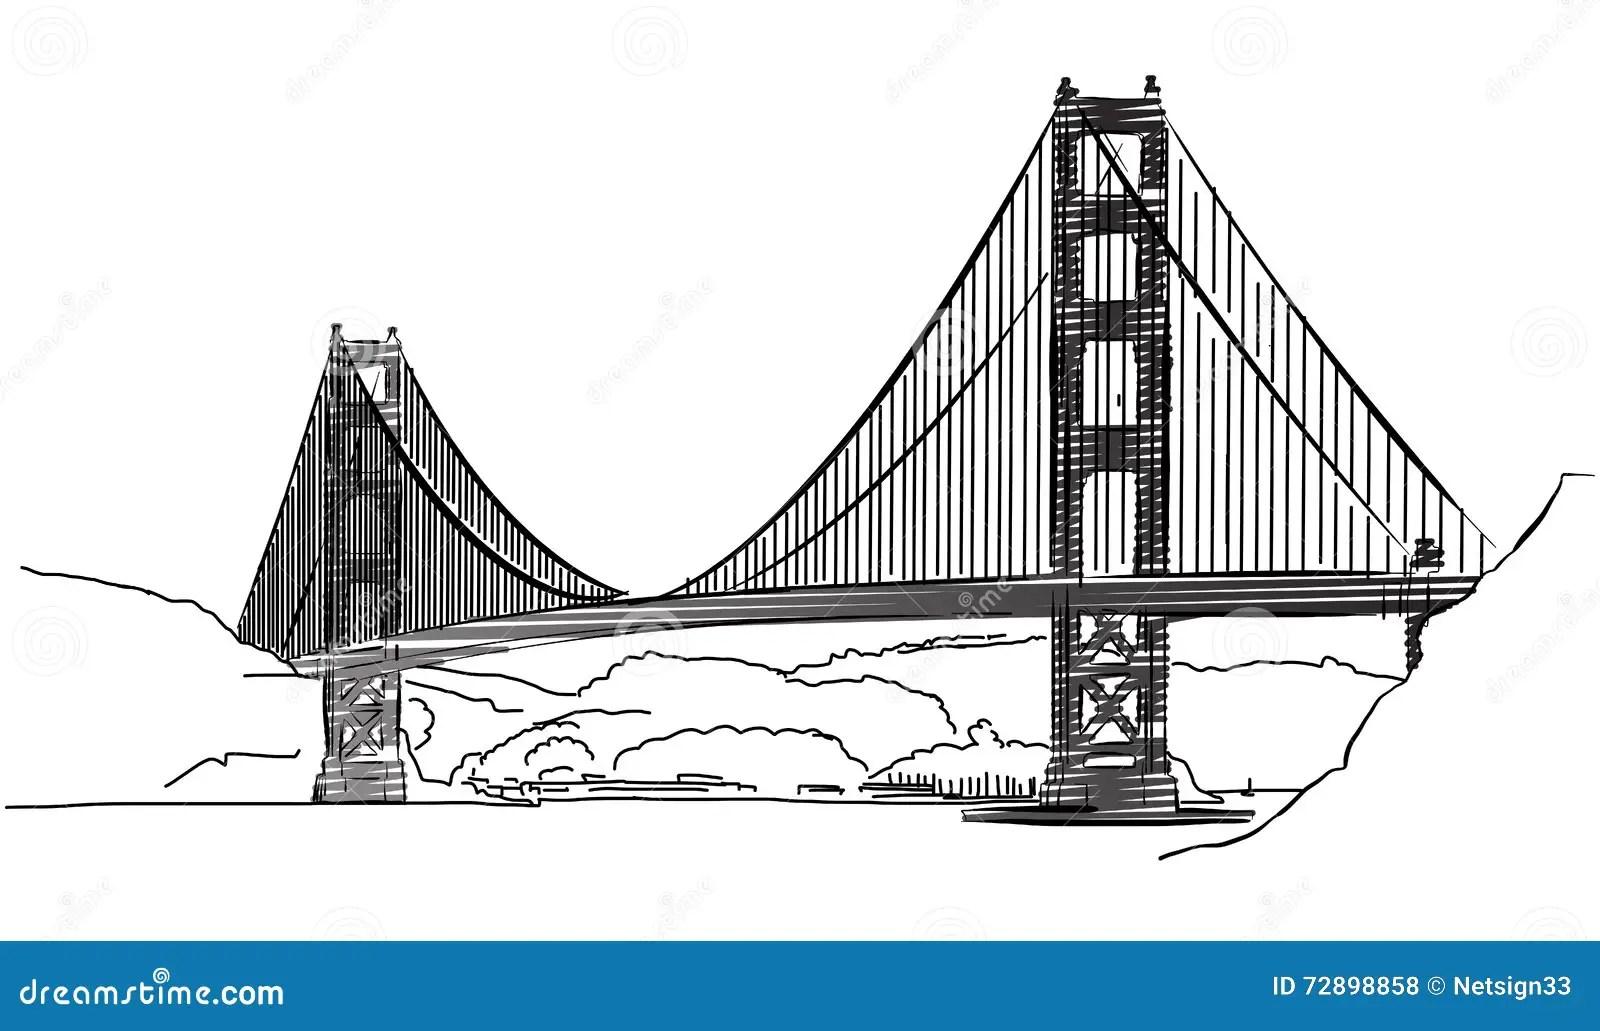 Golden Gate Bridge, San Francisco, Outline Sketch Stock